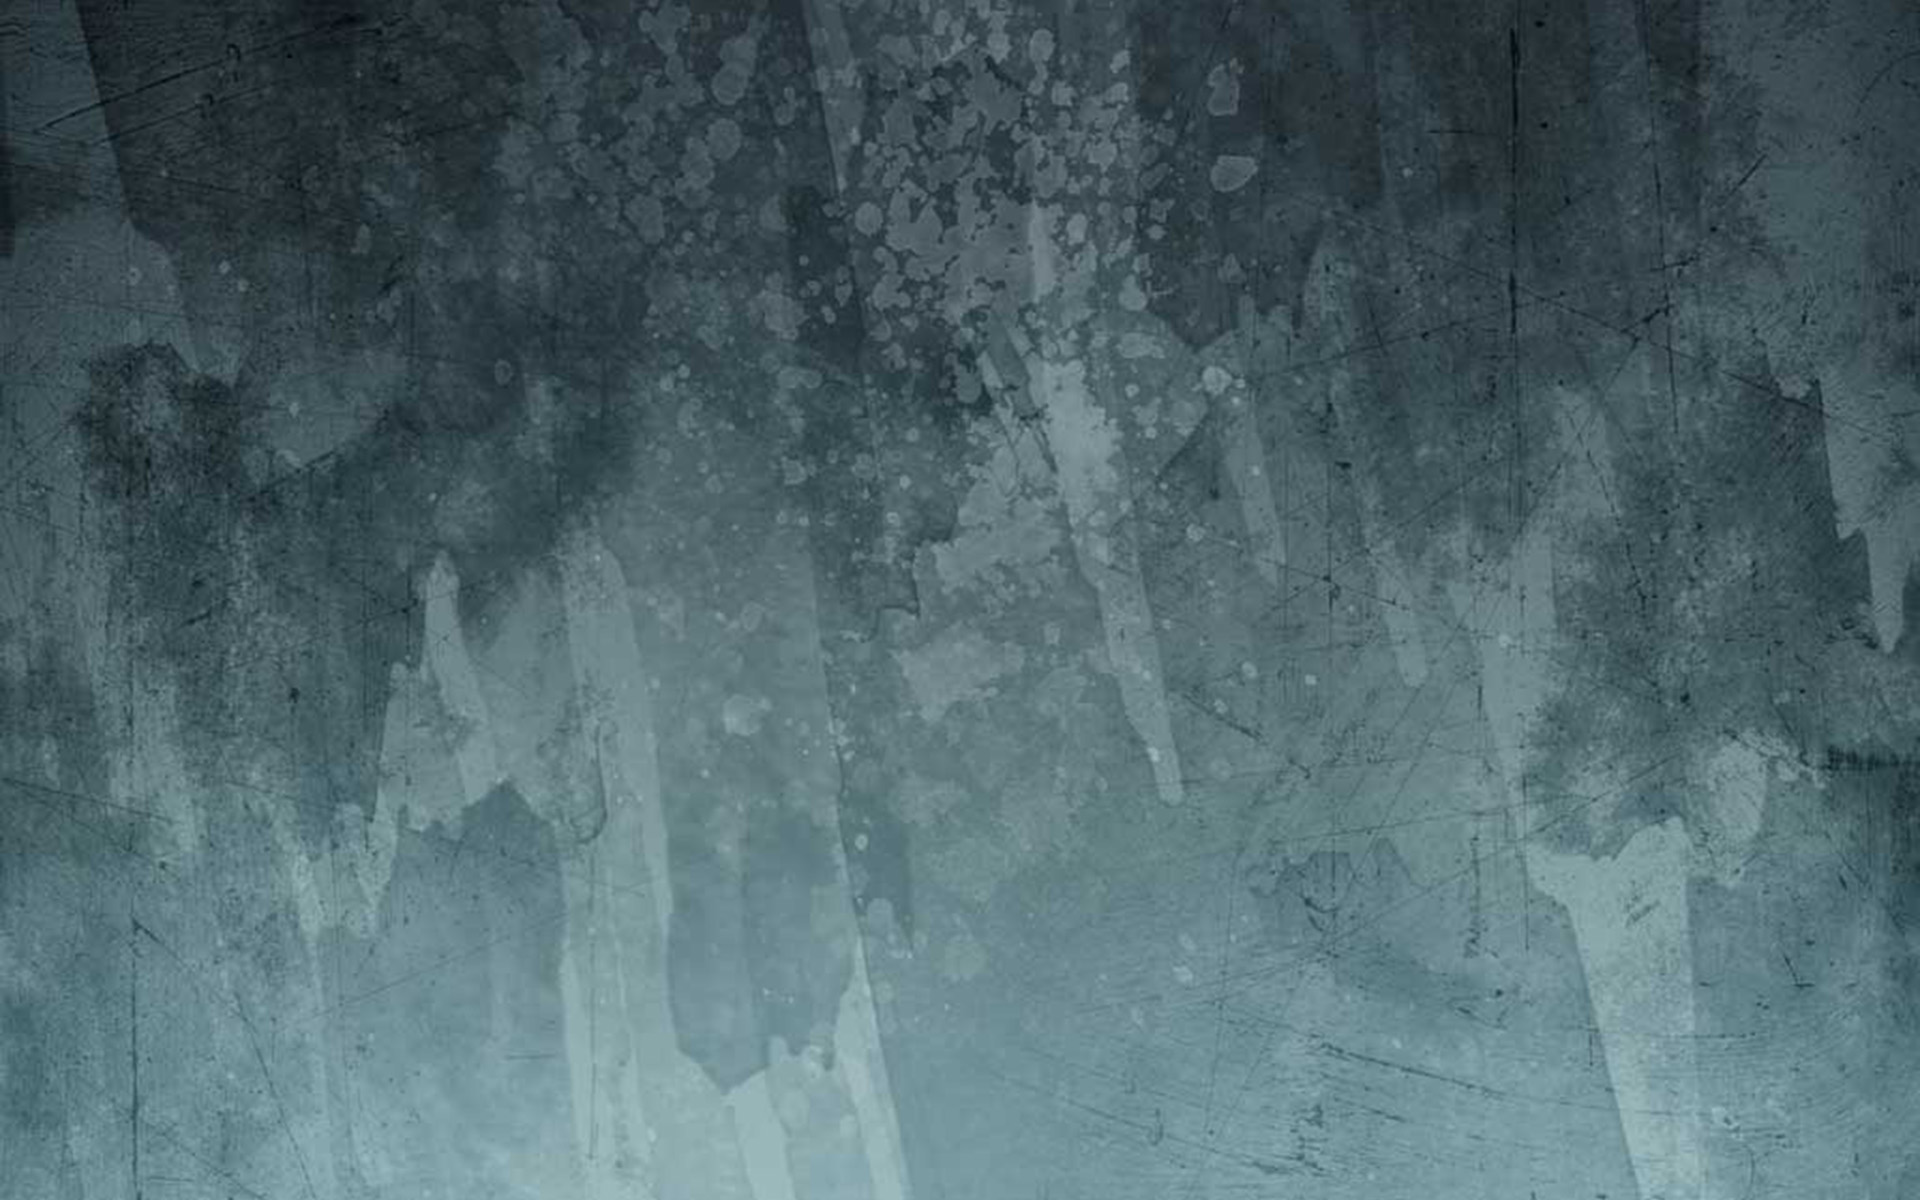 Royalty backgrounds Desktop HD Wallpaper 1920x1200